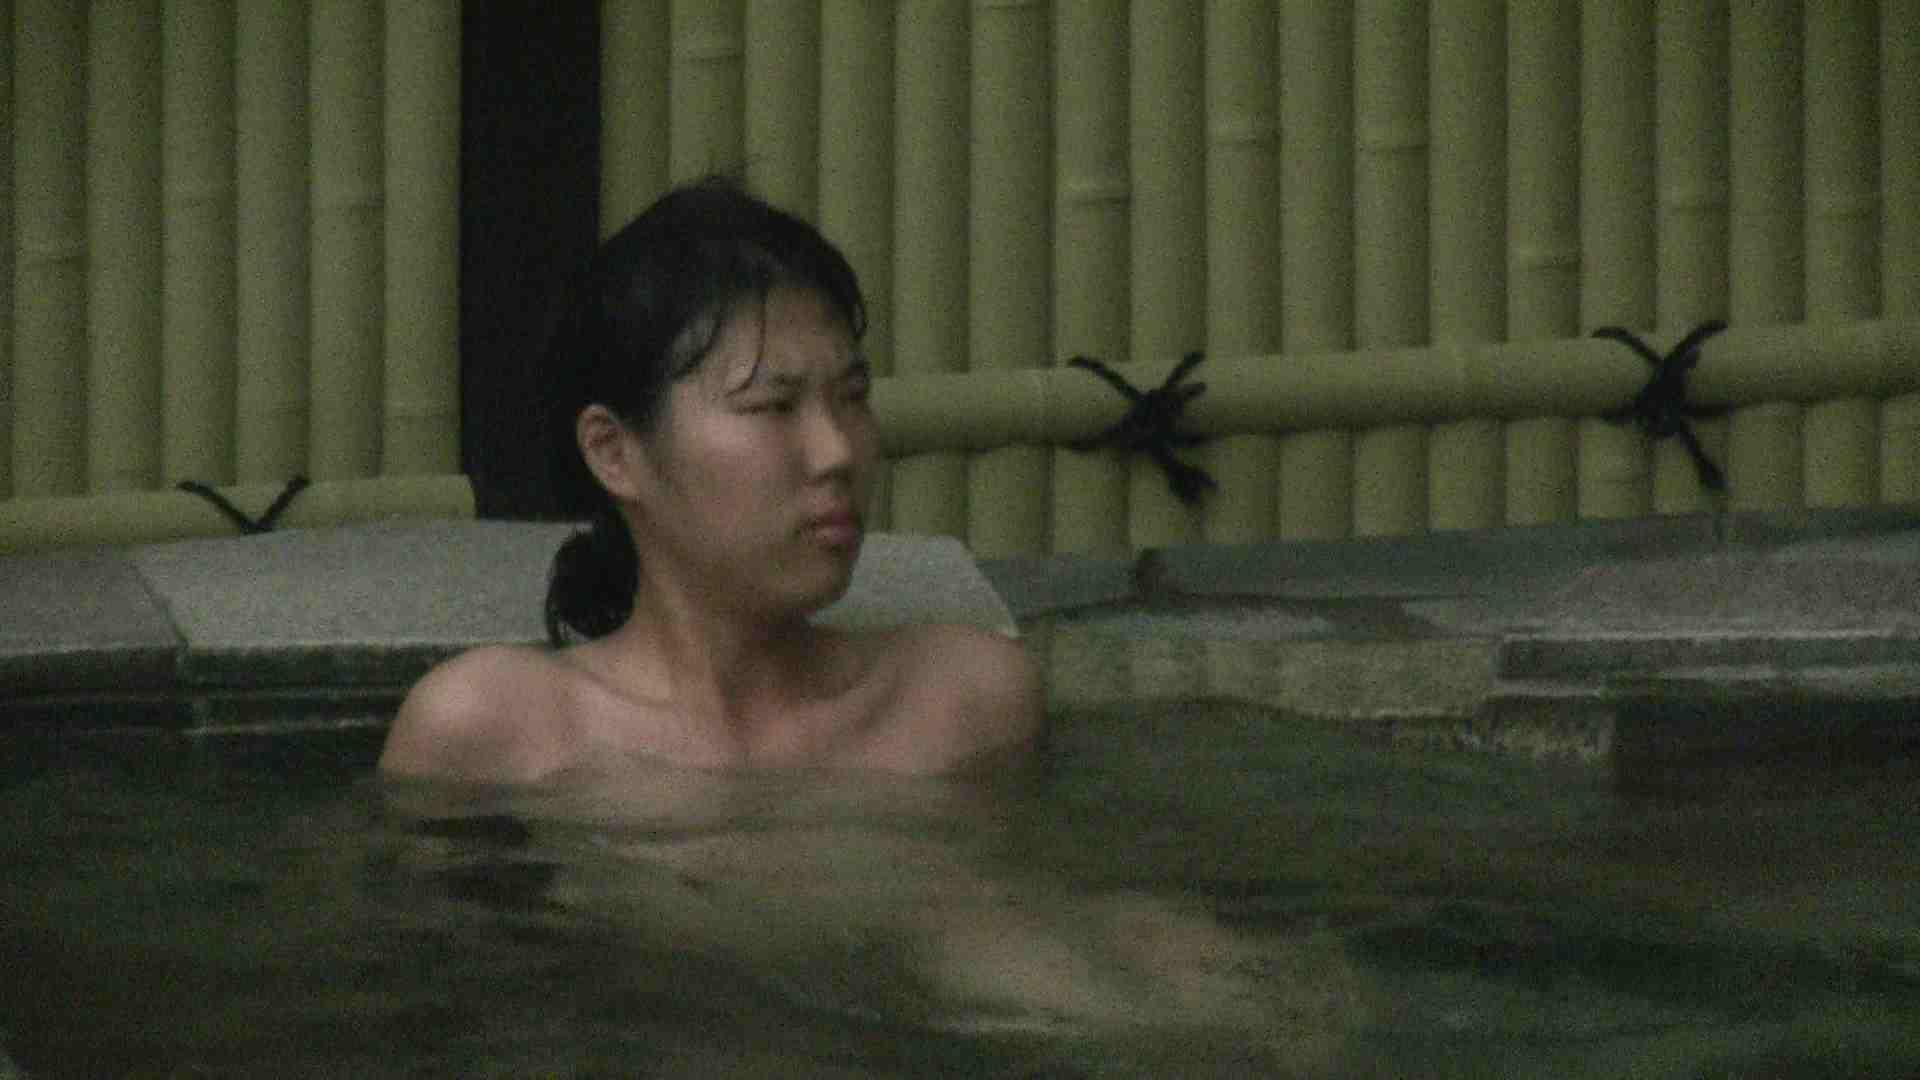 Aquaな露天風呂Vol.215 盗撮 おまんこ無修正動画無料 106枚 38